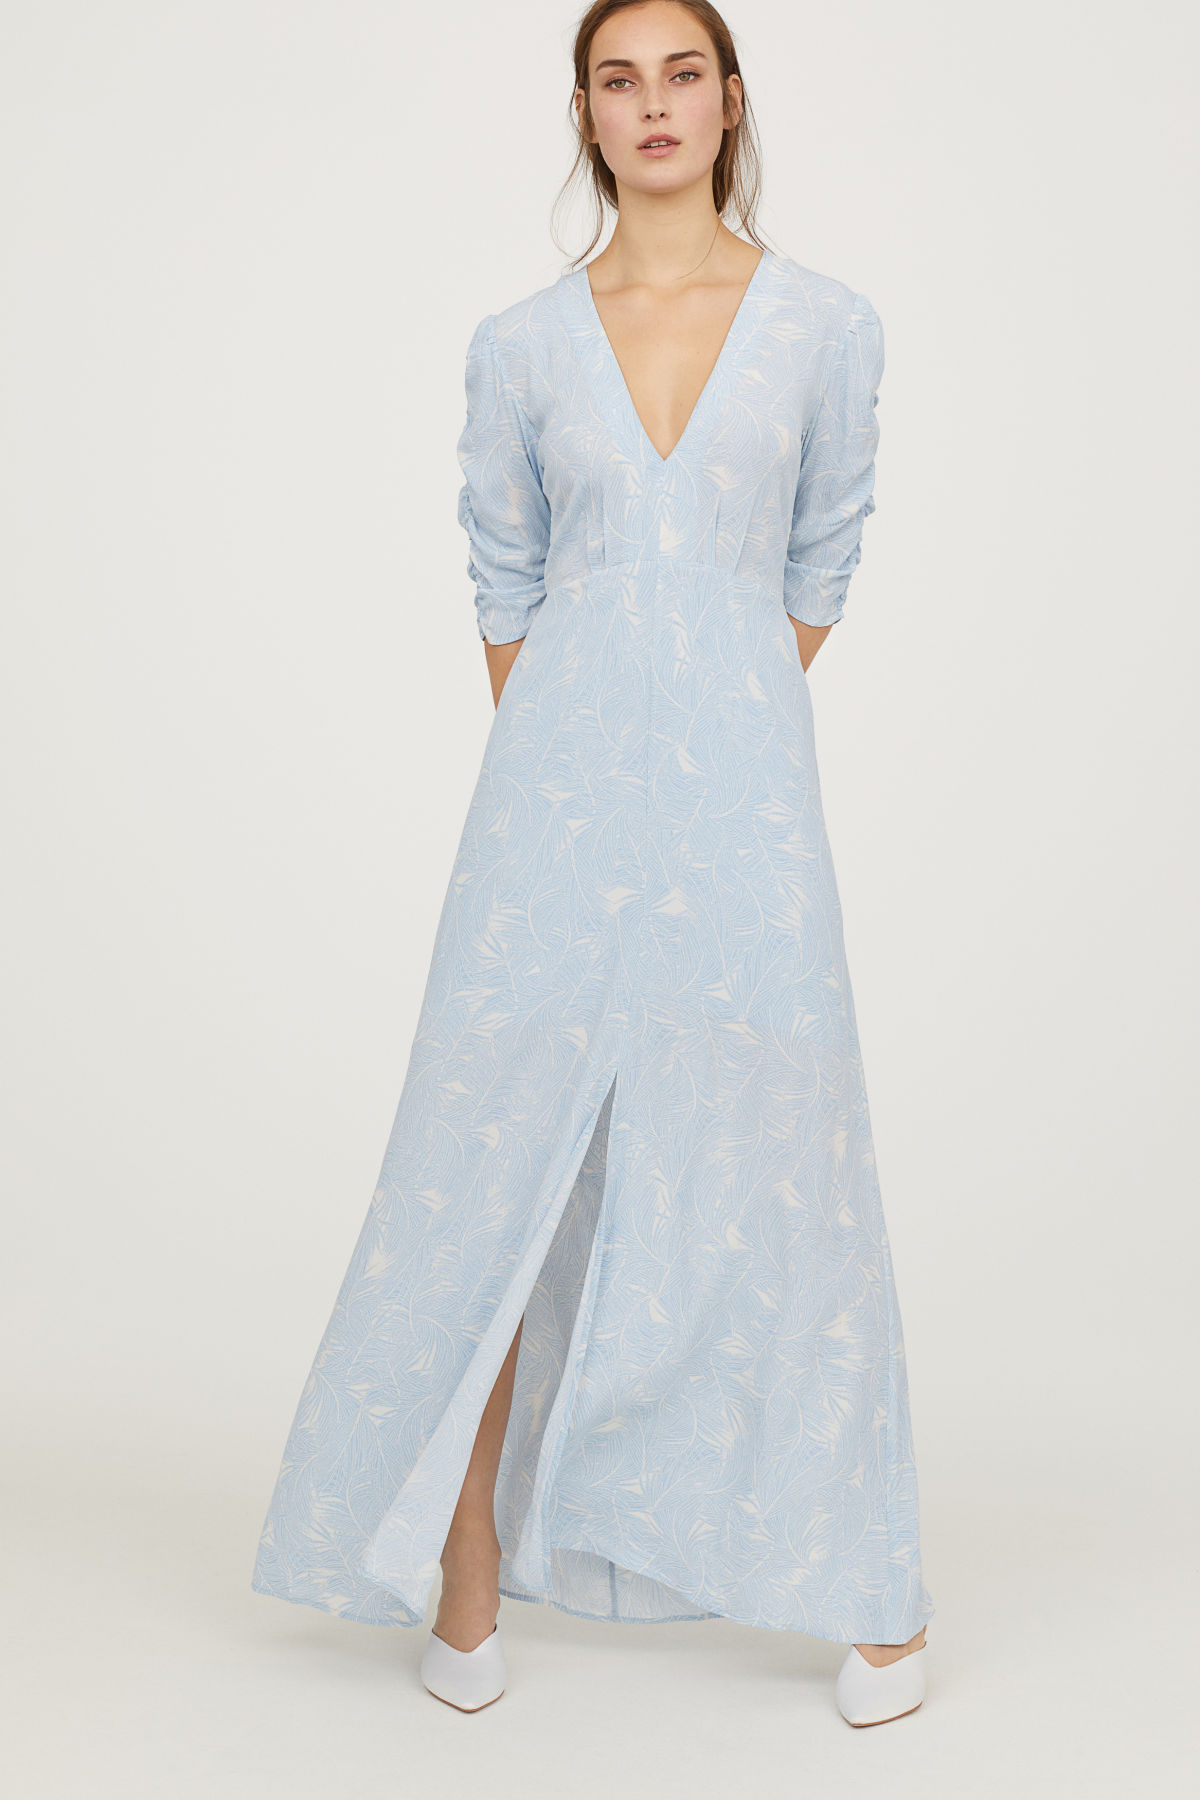 Unique H&m Prom Dresses Photo - All Wedding Dresses ...